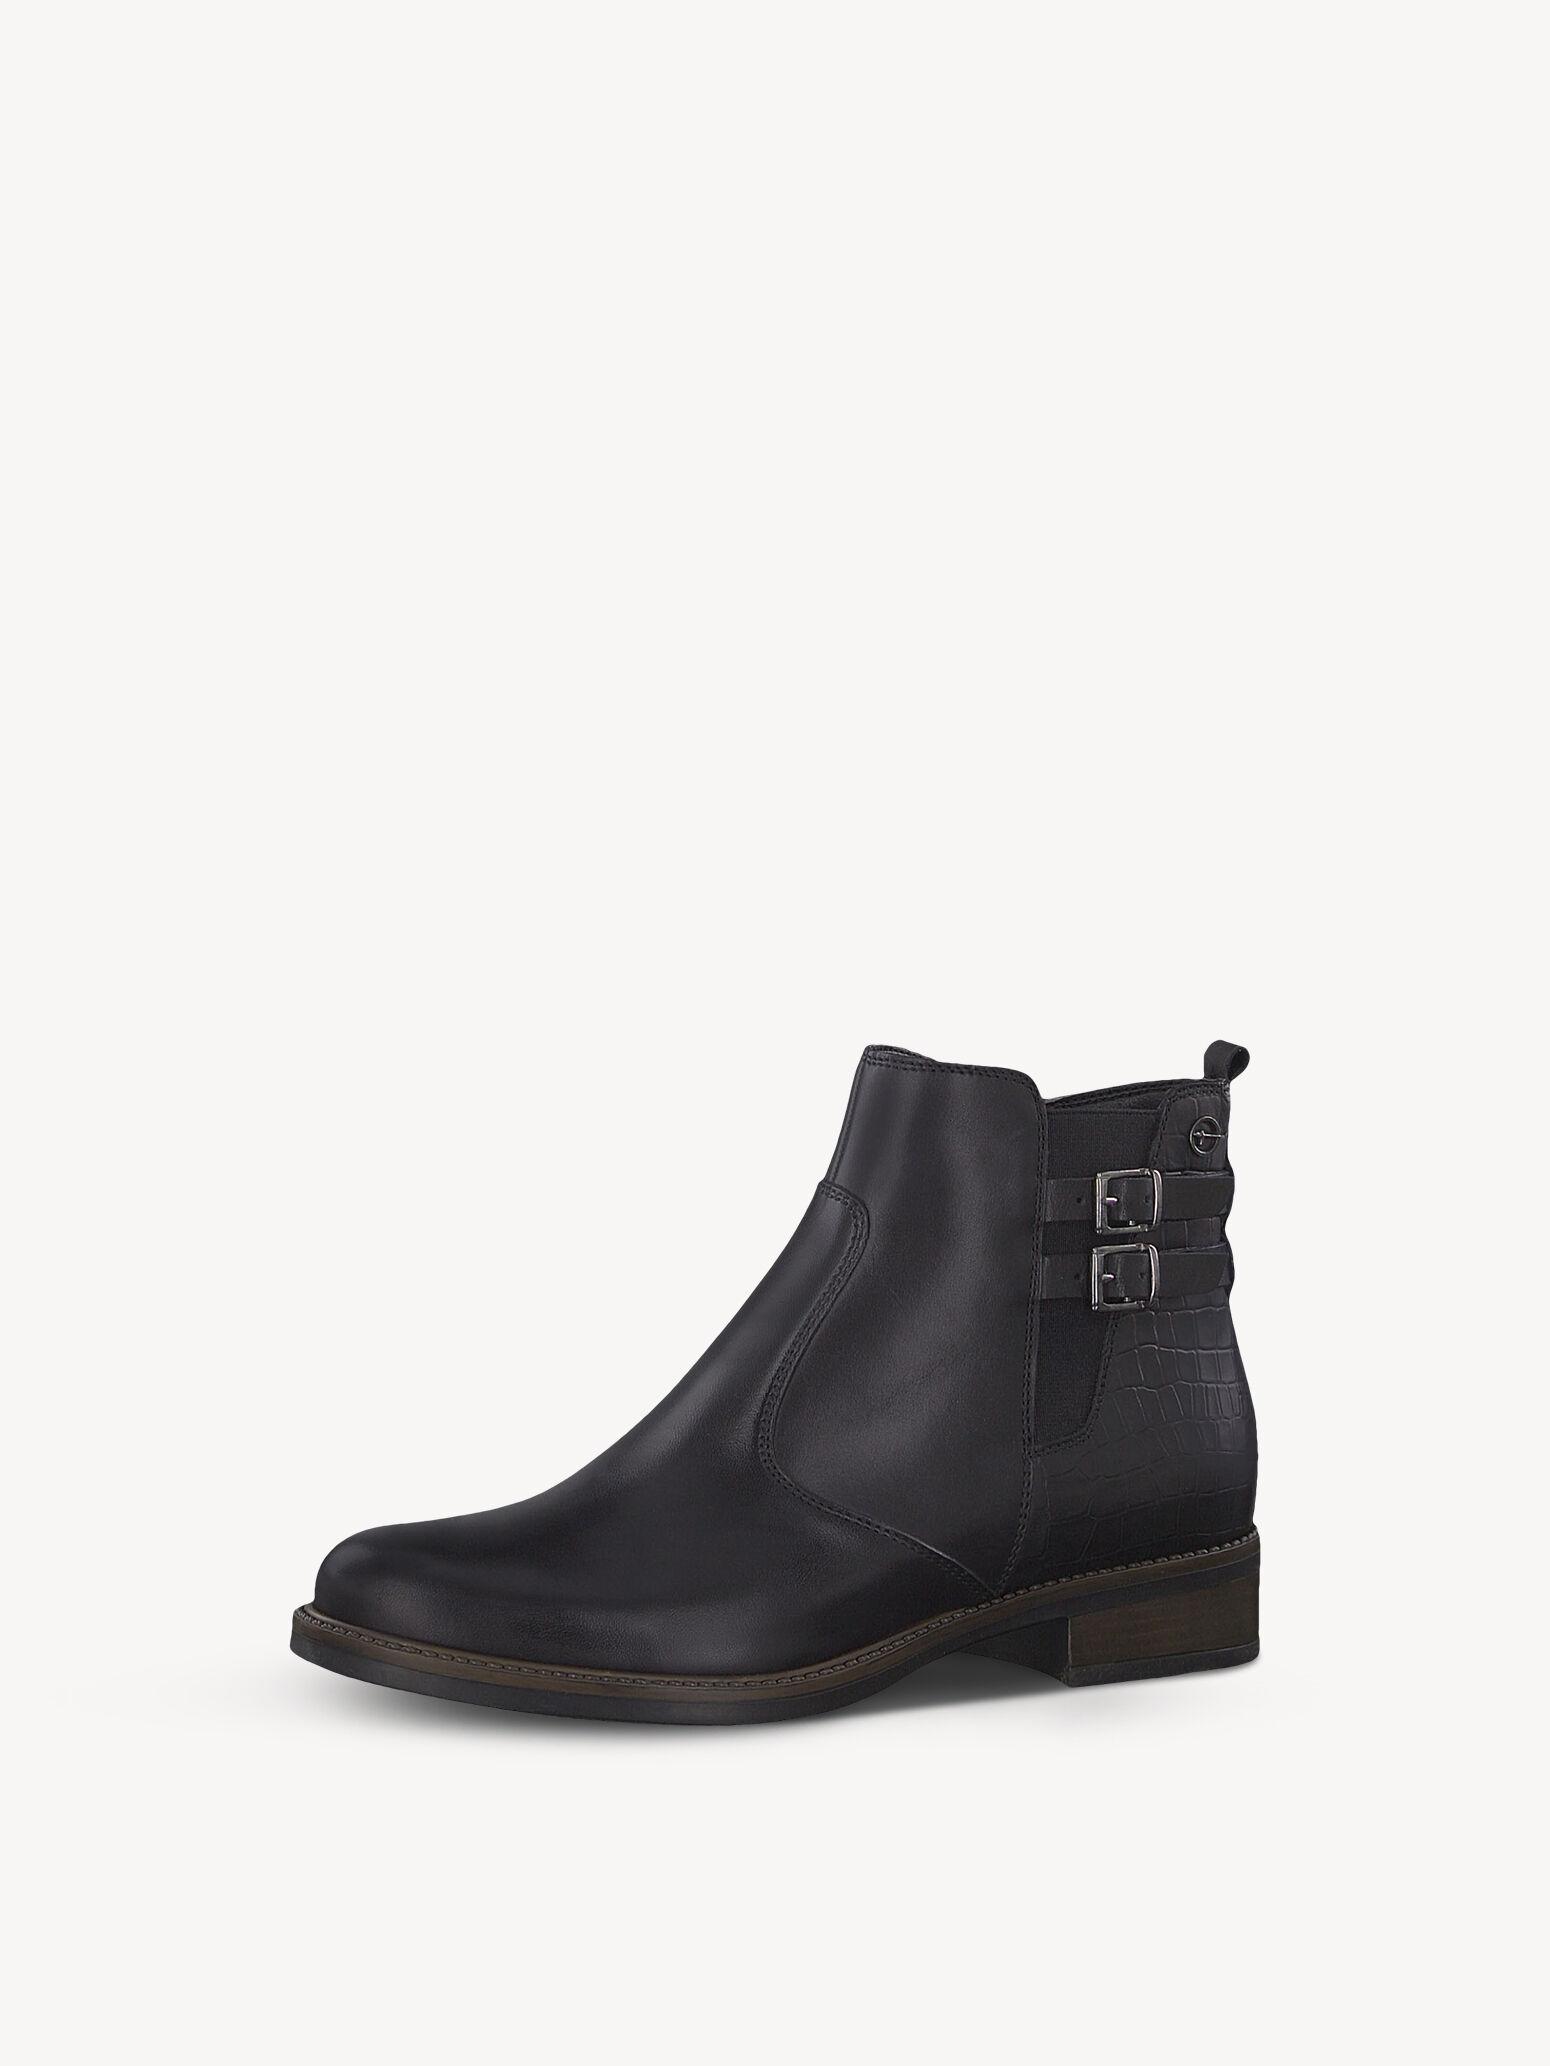 Gut Tamaris Damen Schwarz Schuhe Biker Boots Talues Damen